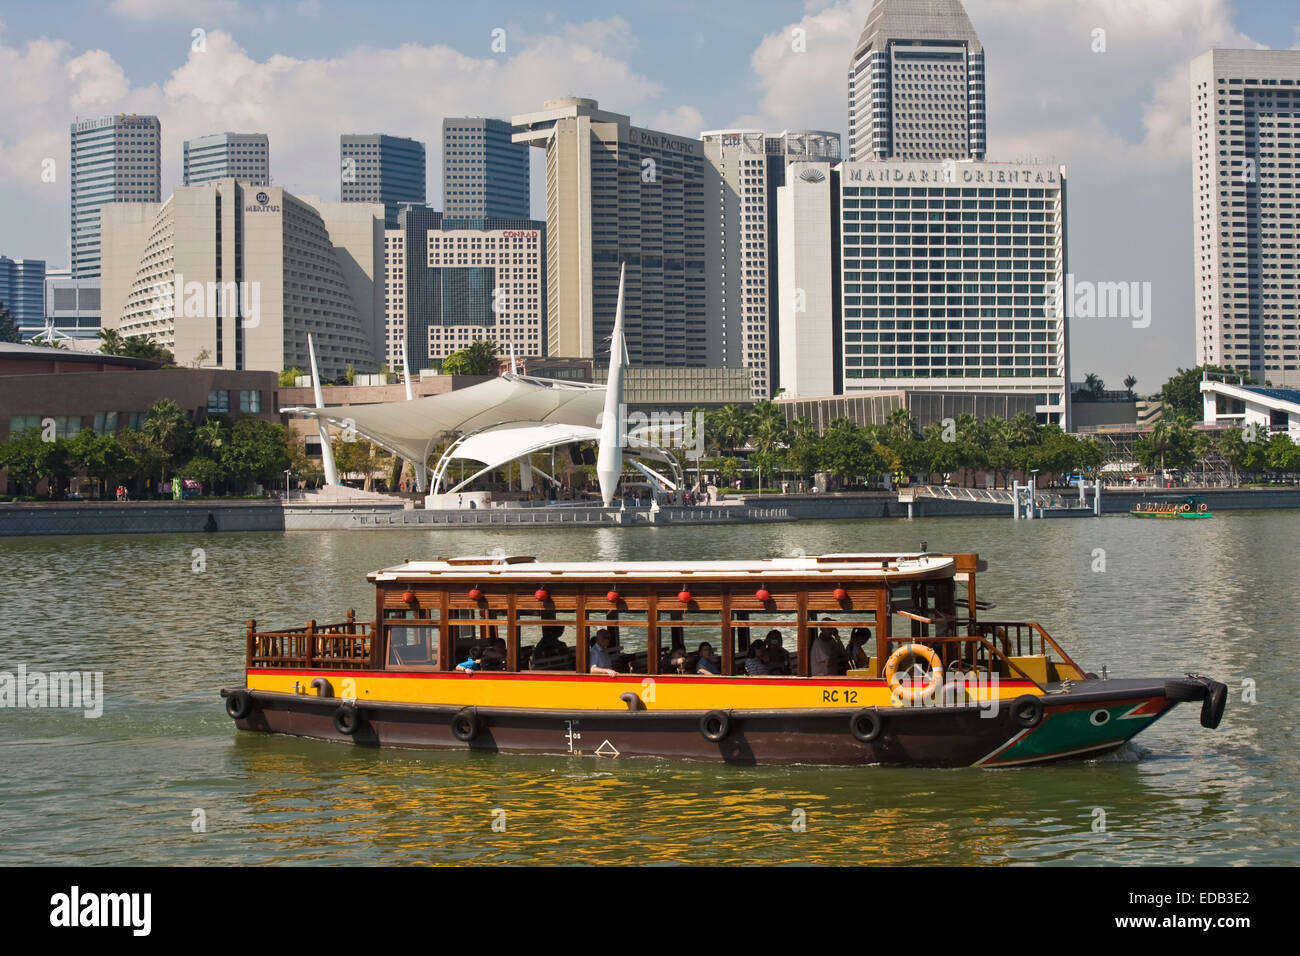 sightseeing boat on the Singapore River, the skyline of Singapore, Marinabay, Esplanade drive, - Stock Image